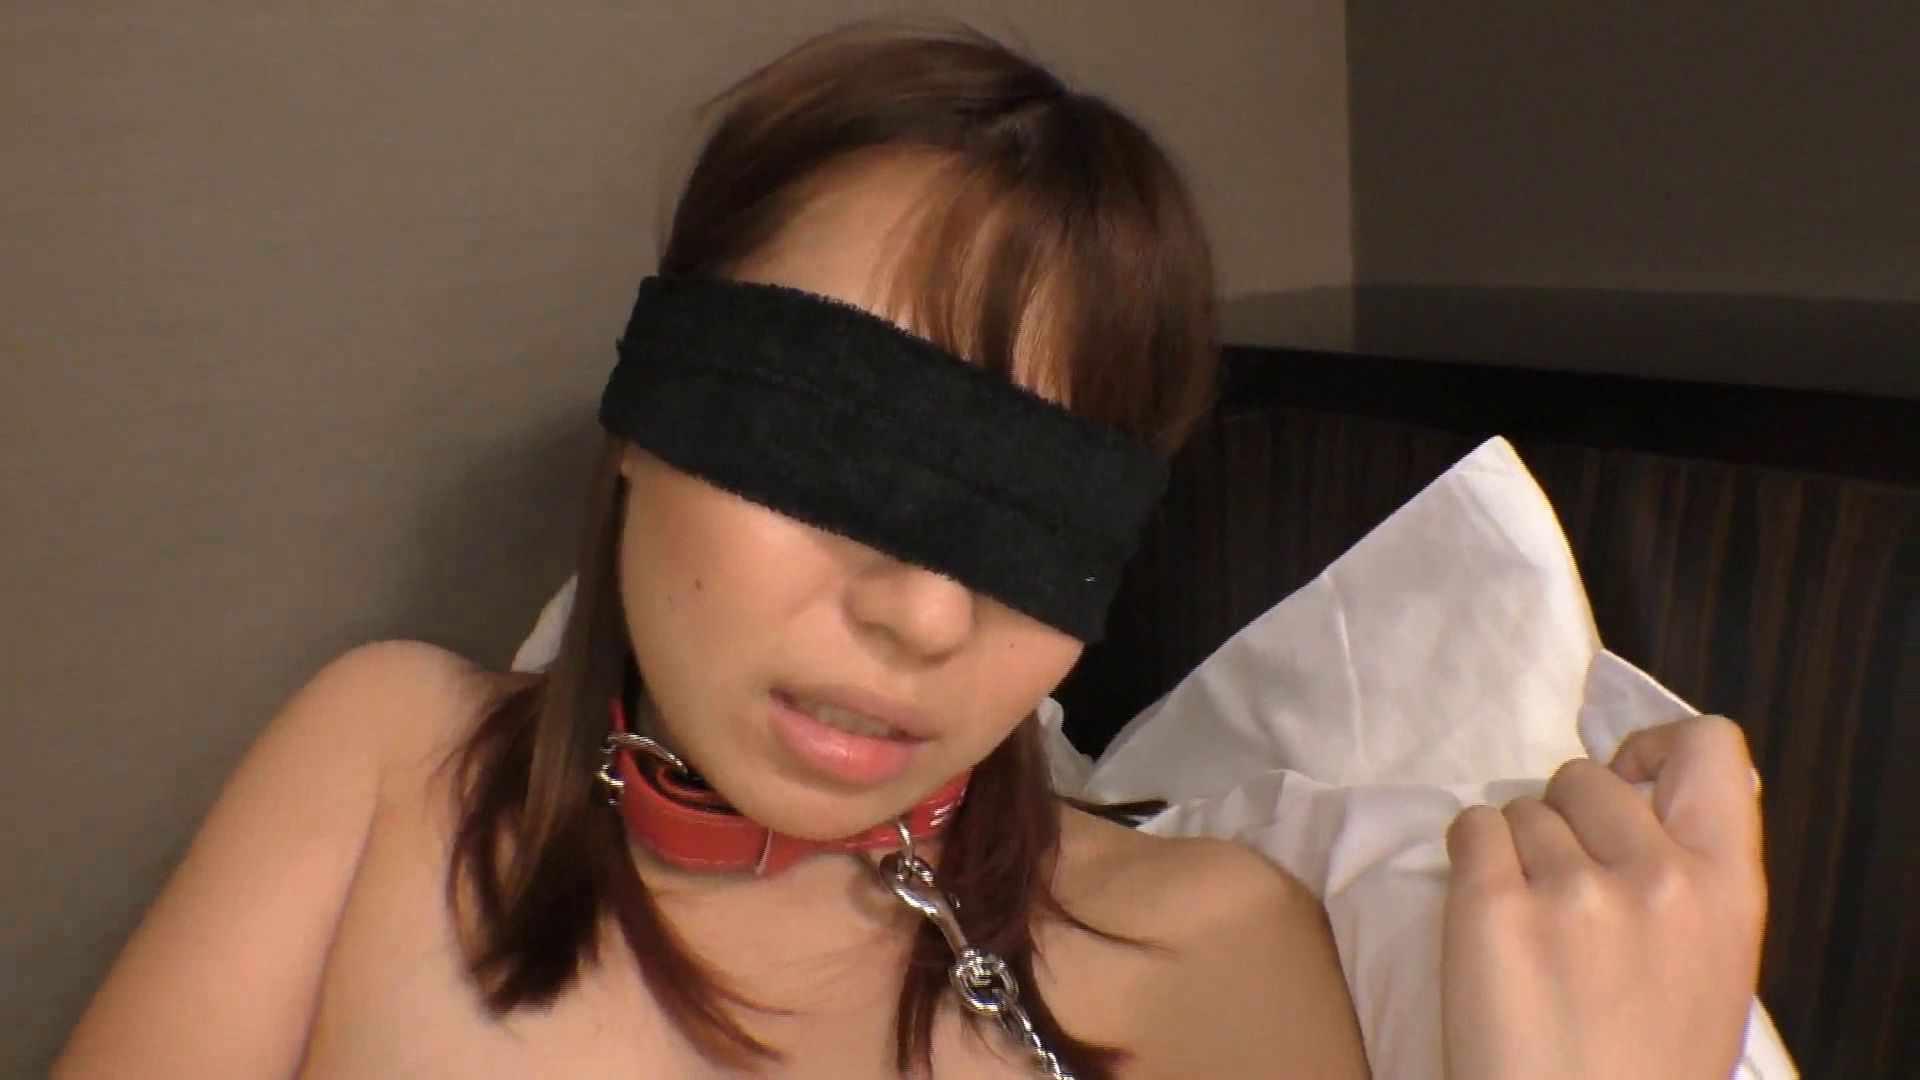 S級厳選美女ビッチガールVol.09 美女ヌード | OLセックス  102画像 34